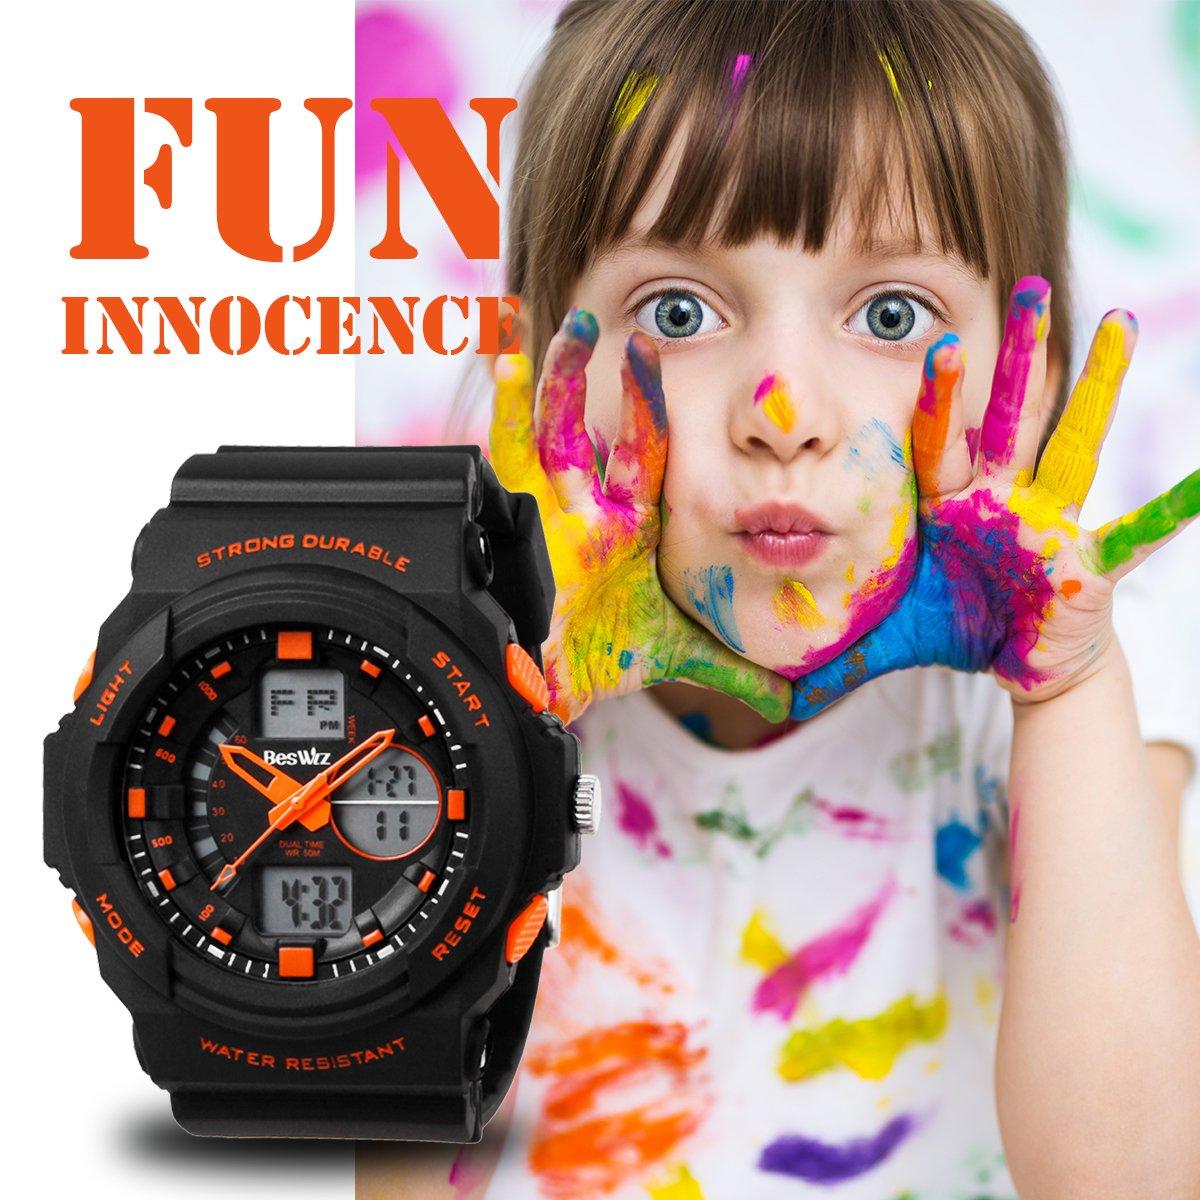 BesWLZ Multi Function Digital LED Quartz Watch Water Resistant Electronic Sport Watches Child Orange by BesWlz (Image #7)